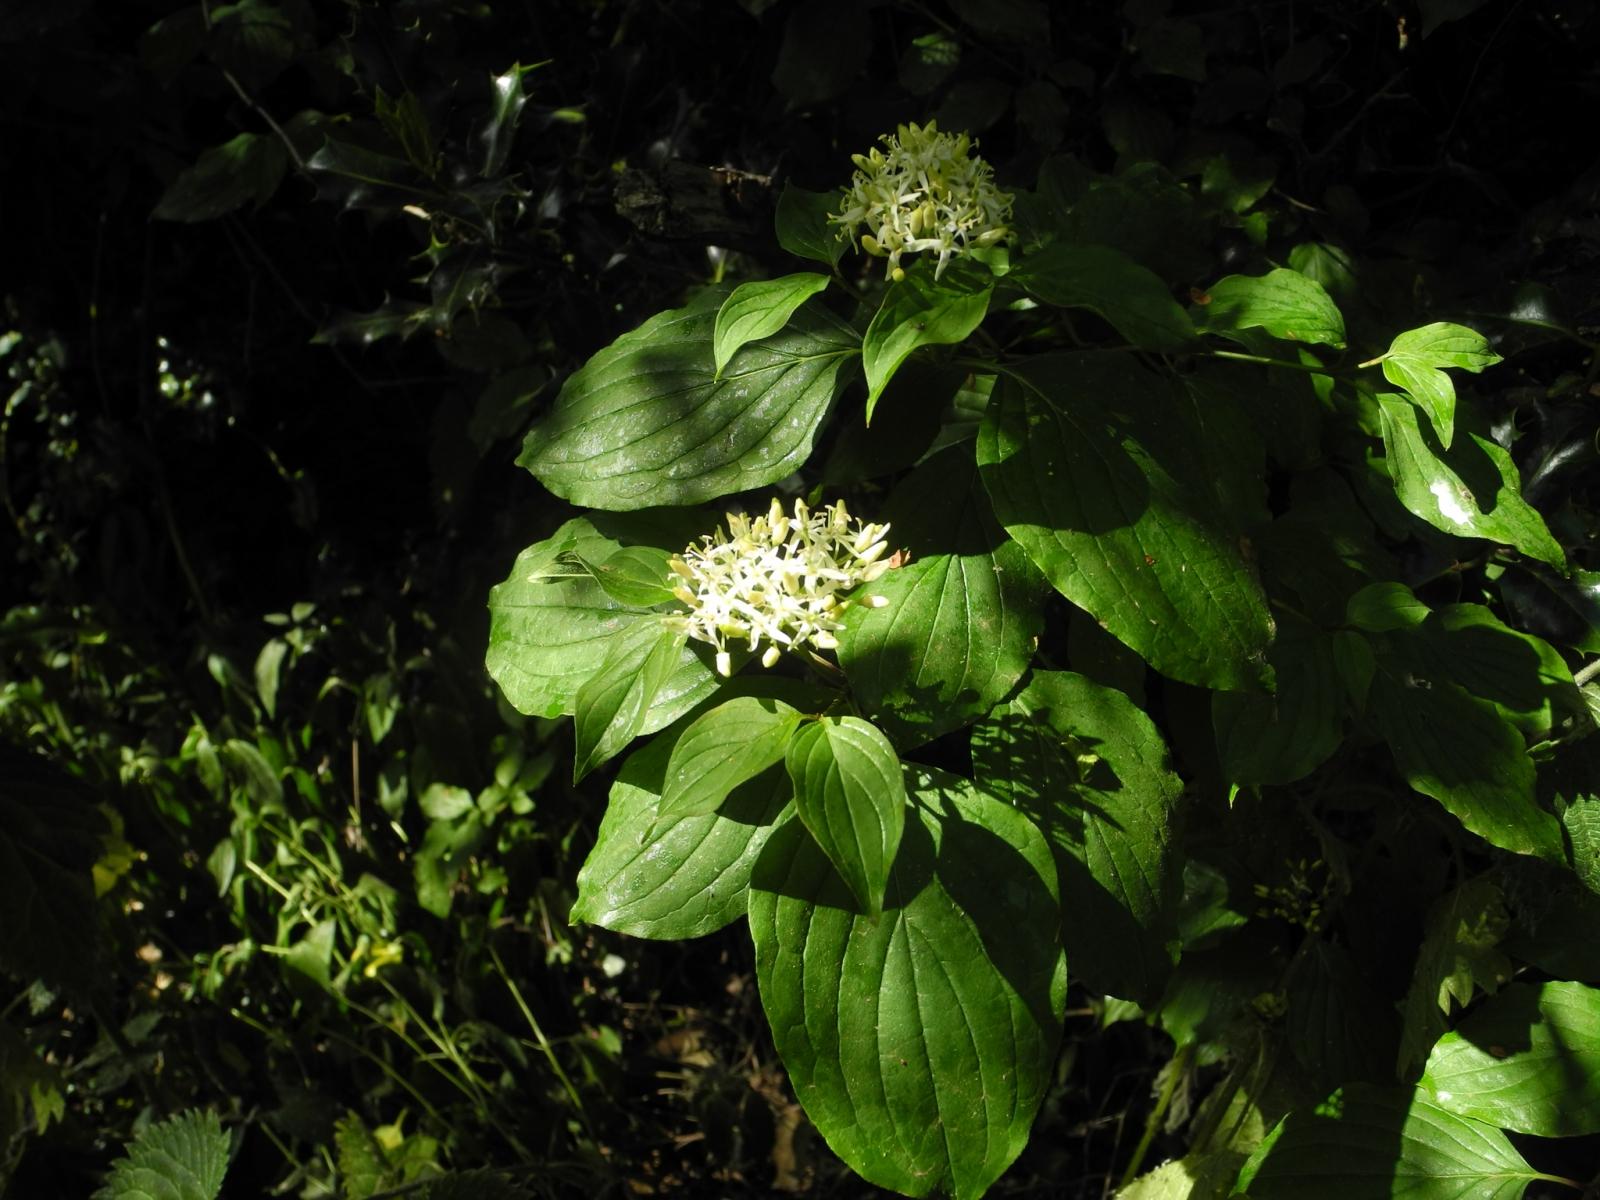 Common Dogwood (Cornus sanguinea), Lindrick Common, Yorkshire.